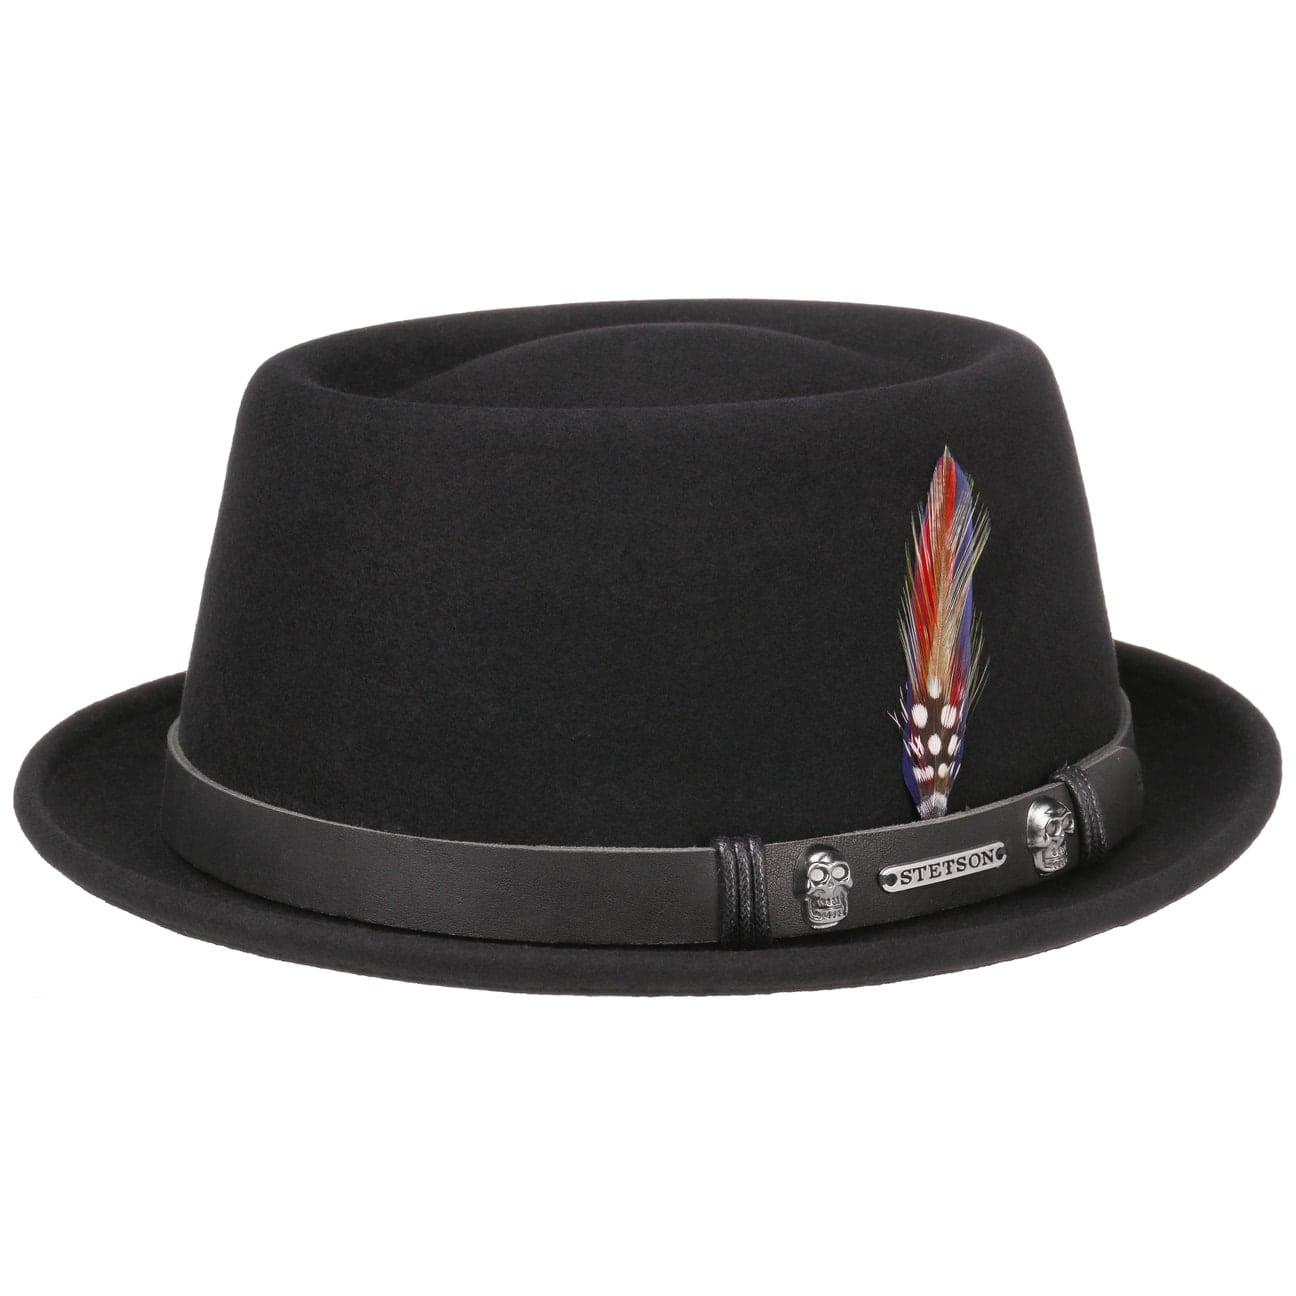 Sombrero Pennsylvania Woolfelt by Stetson - Sombreros - sombreroshop.es e54b2ecb912